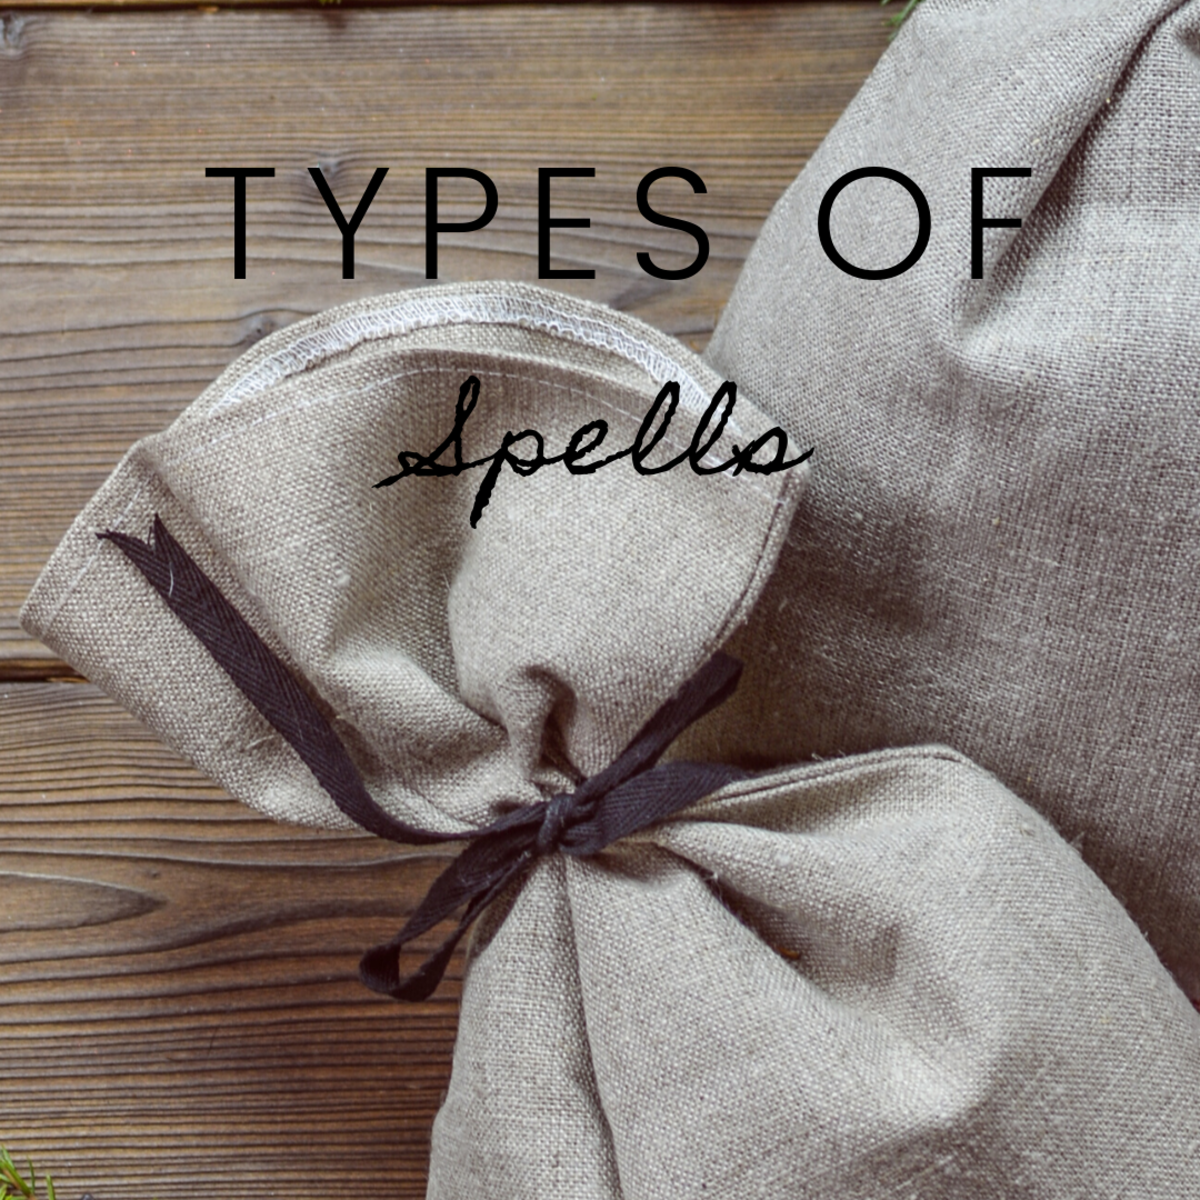 Types of Spells